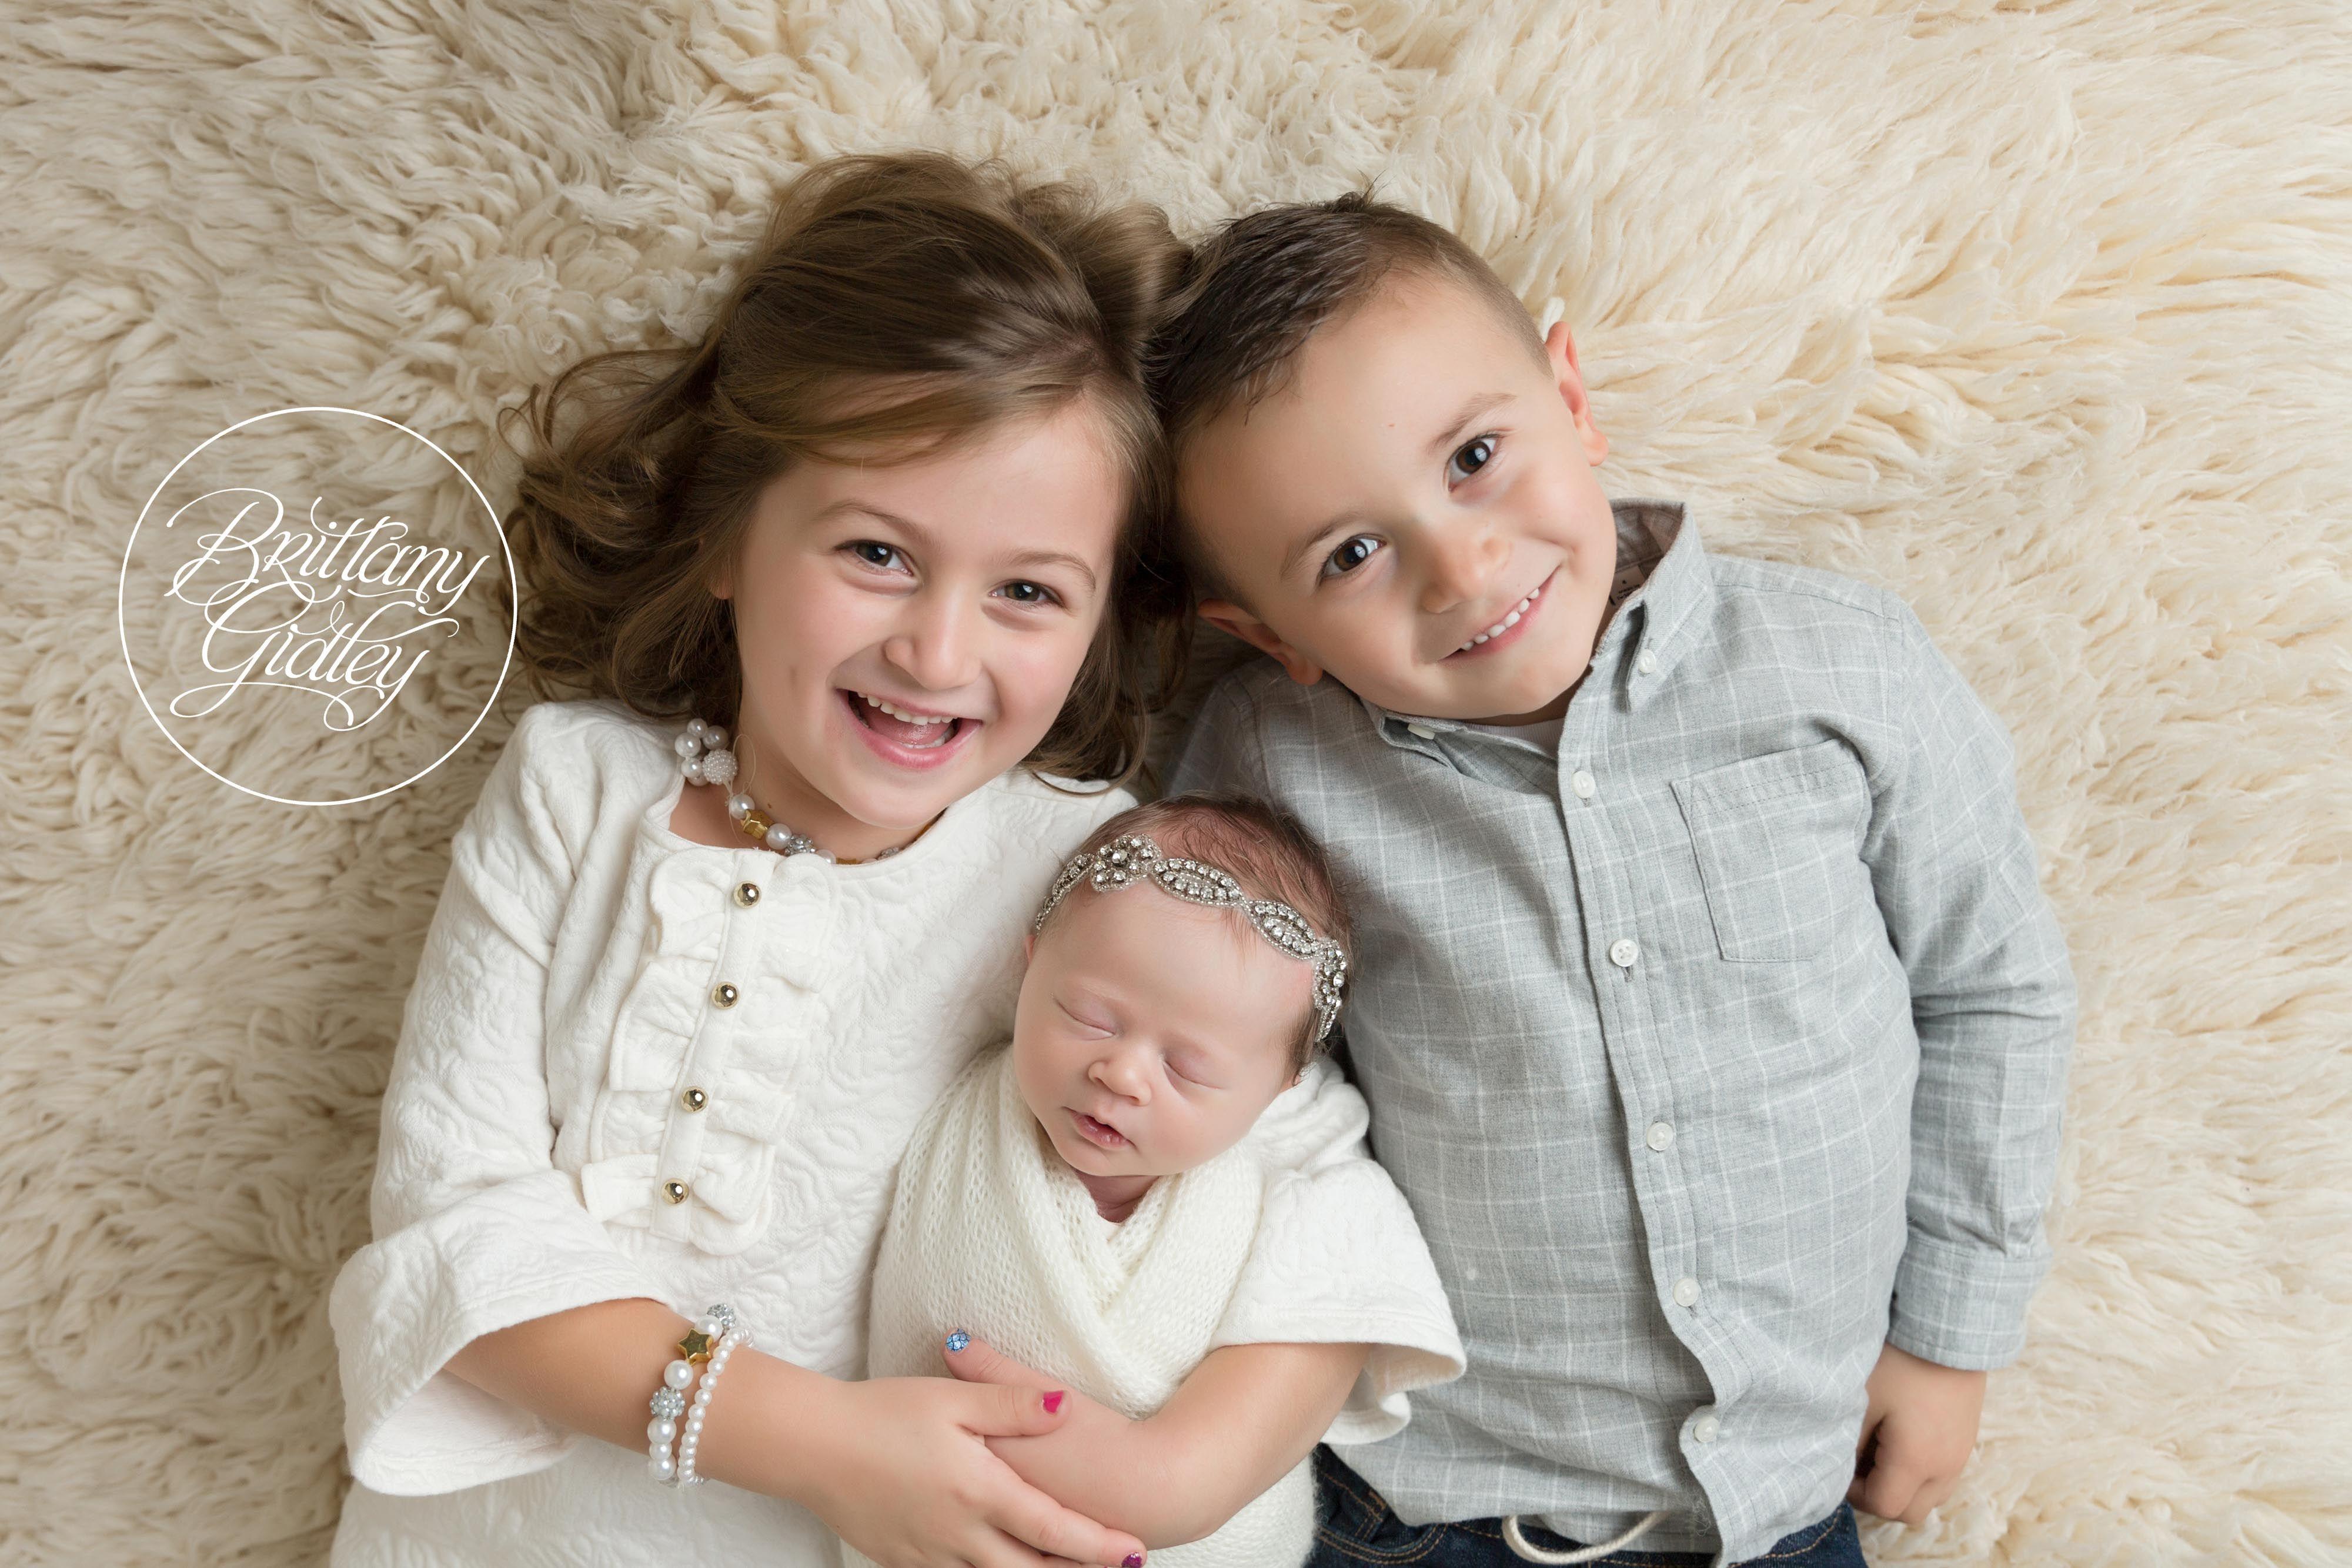 Newborn Baby Photo Shoot | Introducing Isabella | Newborn ...